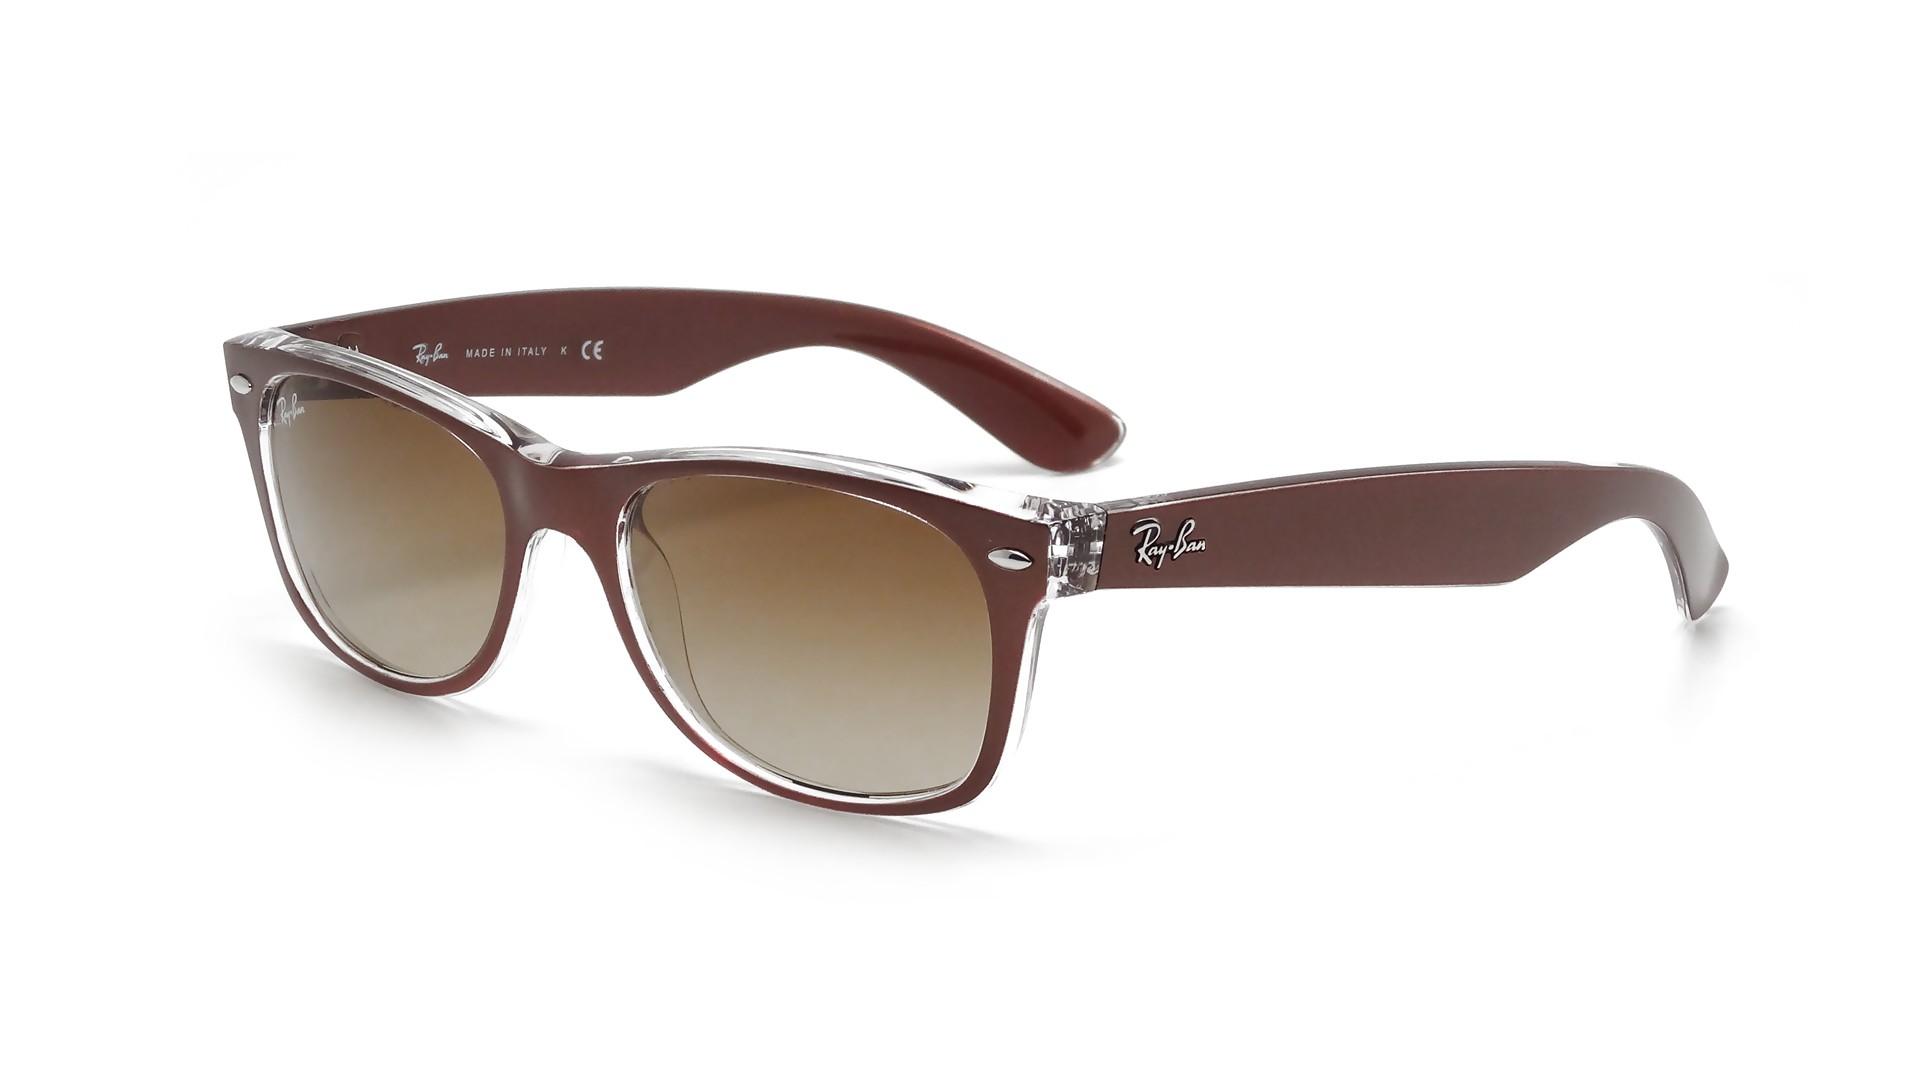 8527e92a90c Sunglasses Ray-Ban New Wayfarer Metal Effect Brown RB2132 6145 85 55-18  Large Gradient